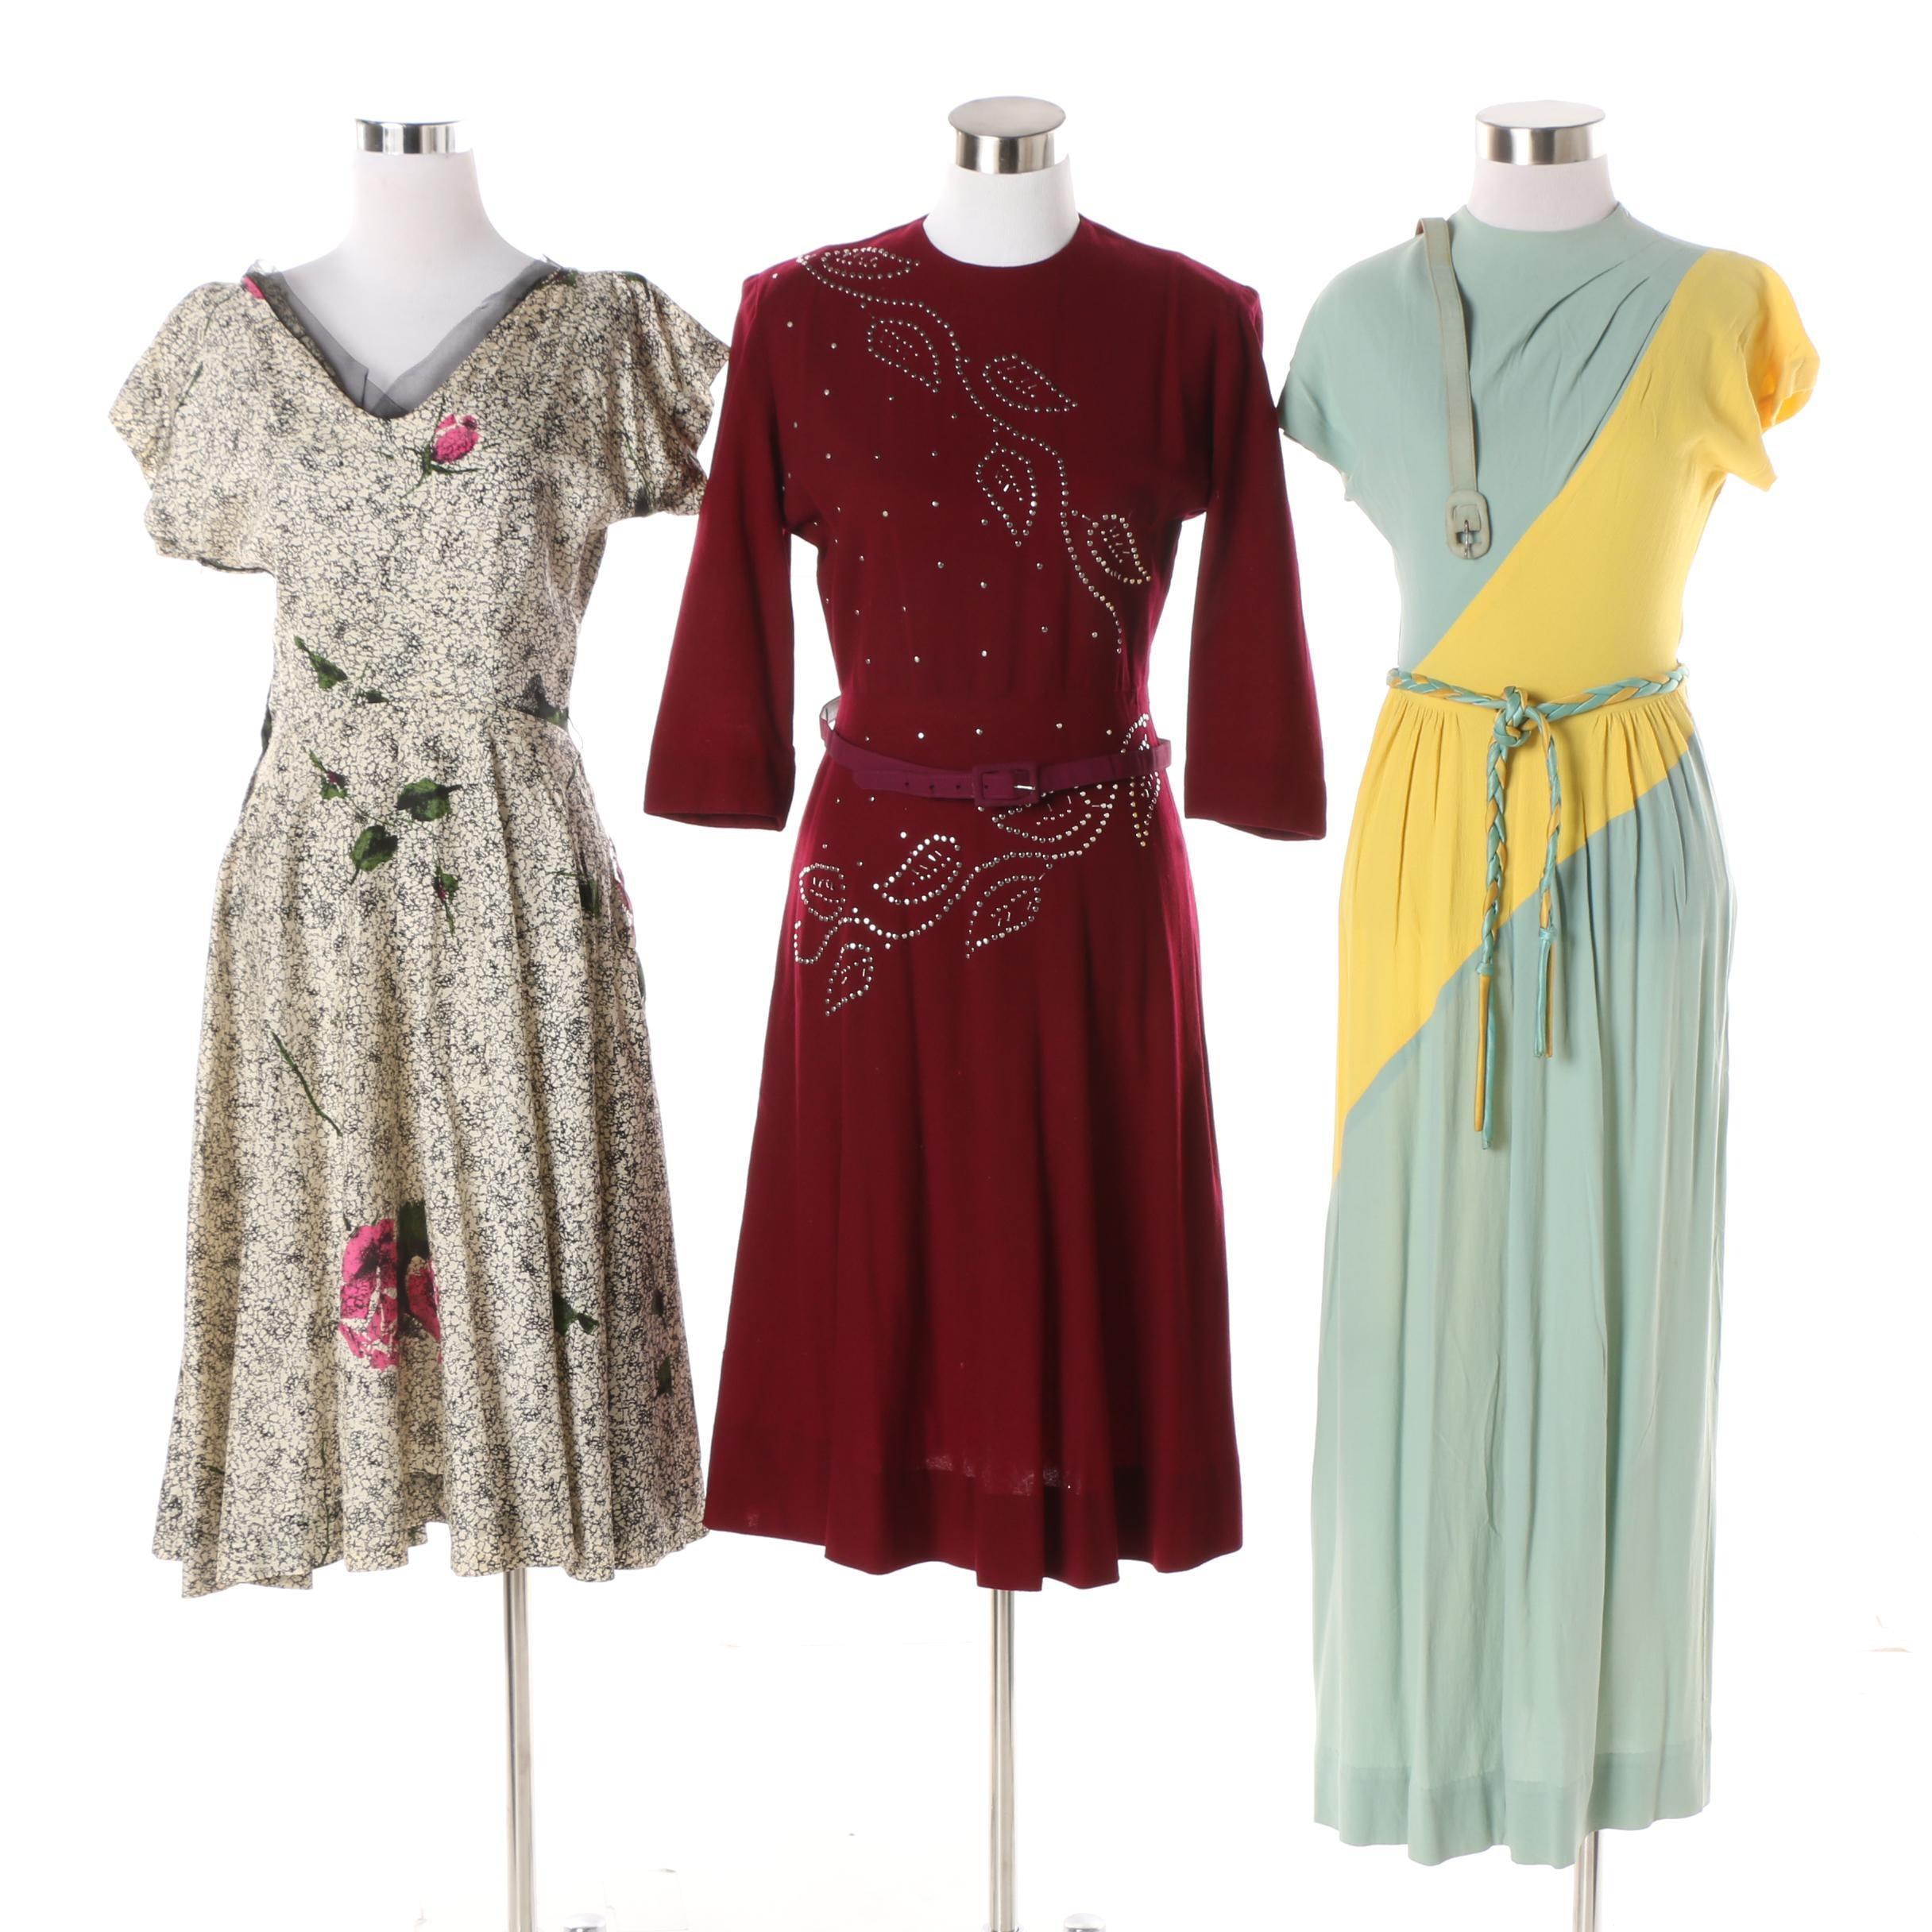 Women's 1950-60s Vintage Dresses including Ruth Jones and Blum's Vogue